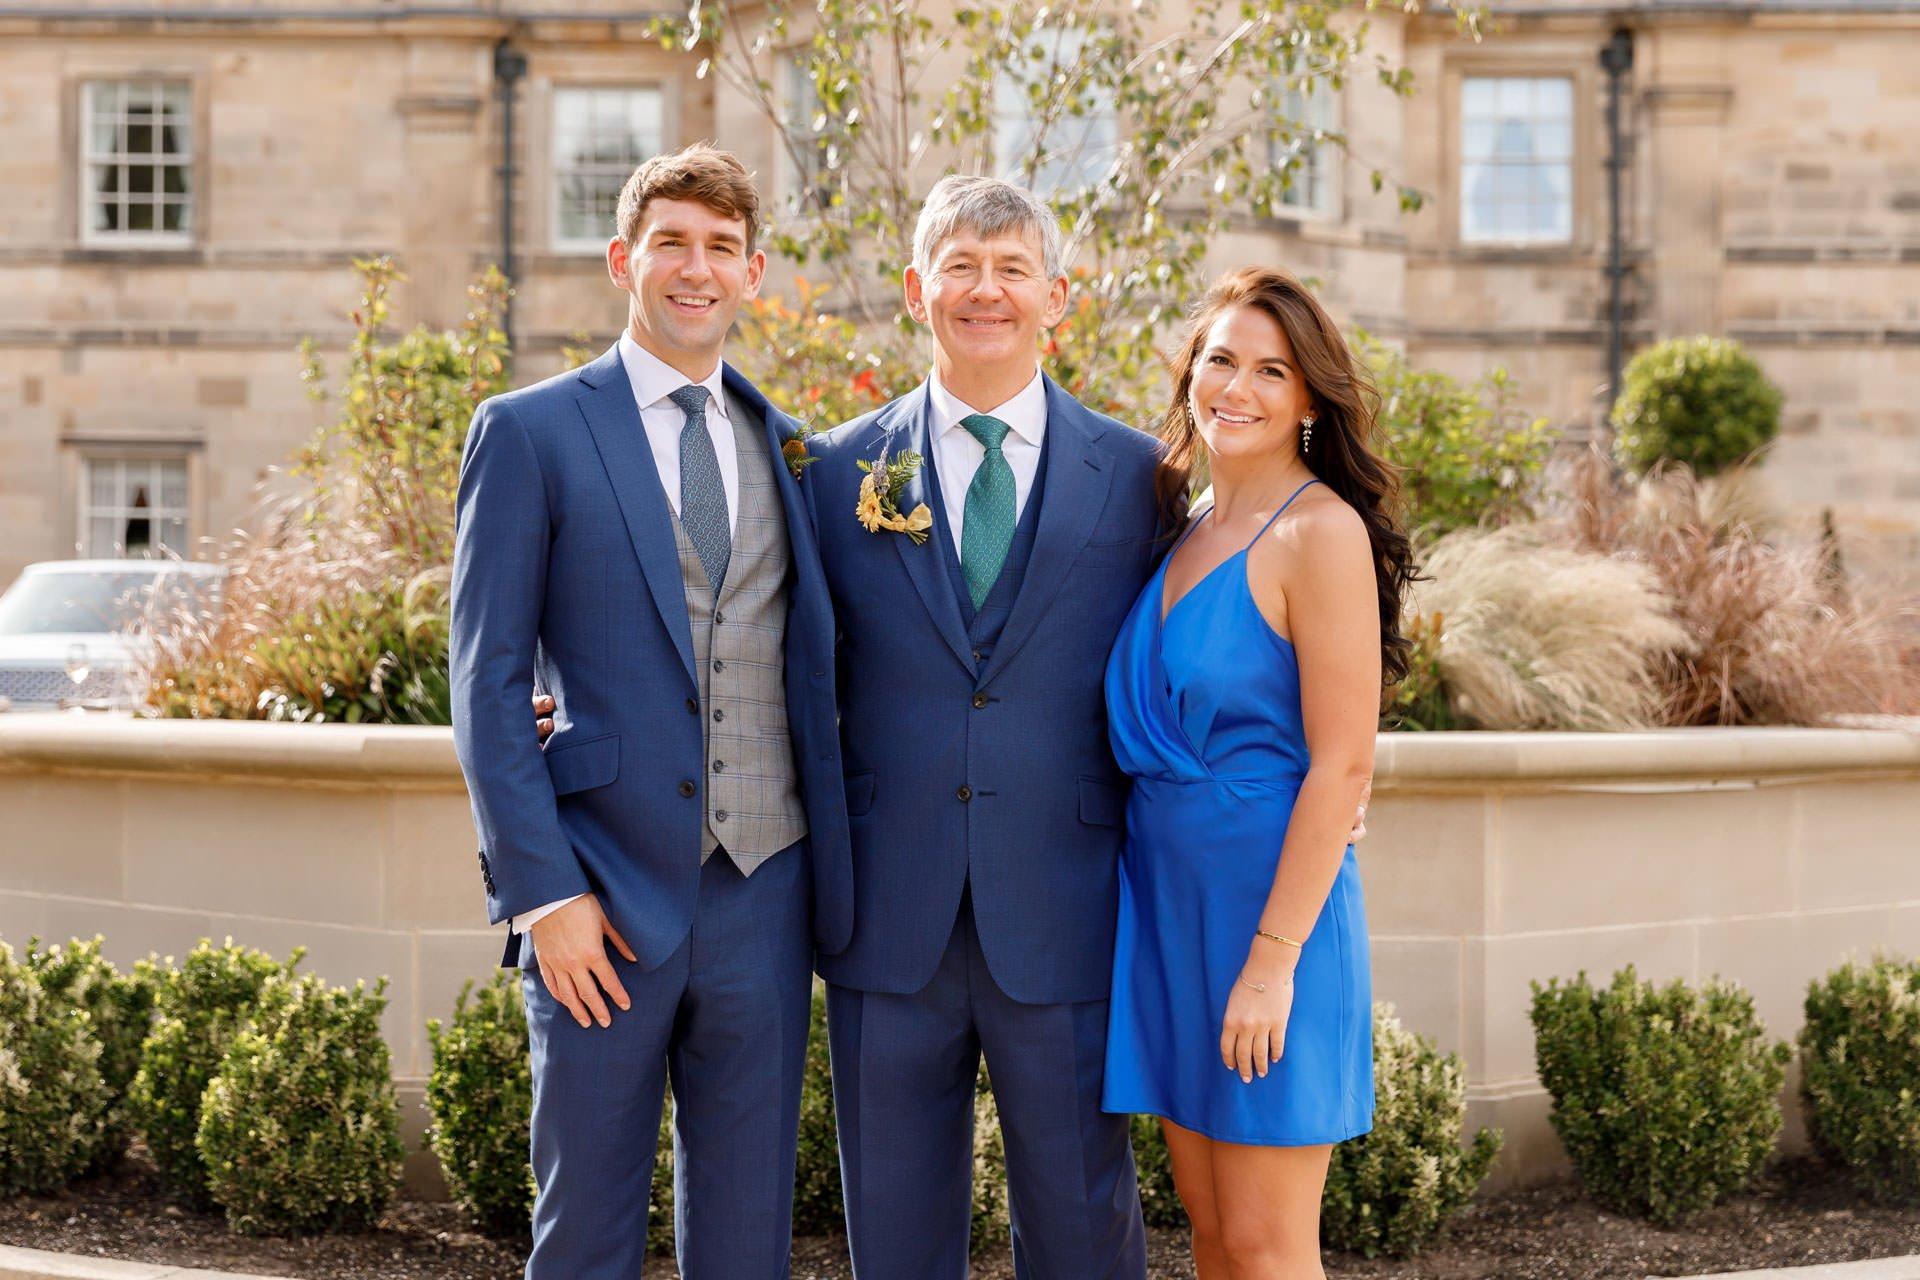 Advanced wedding photography editing